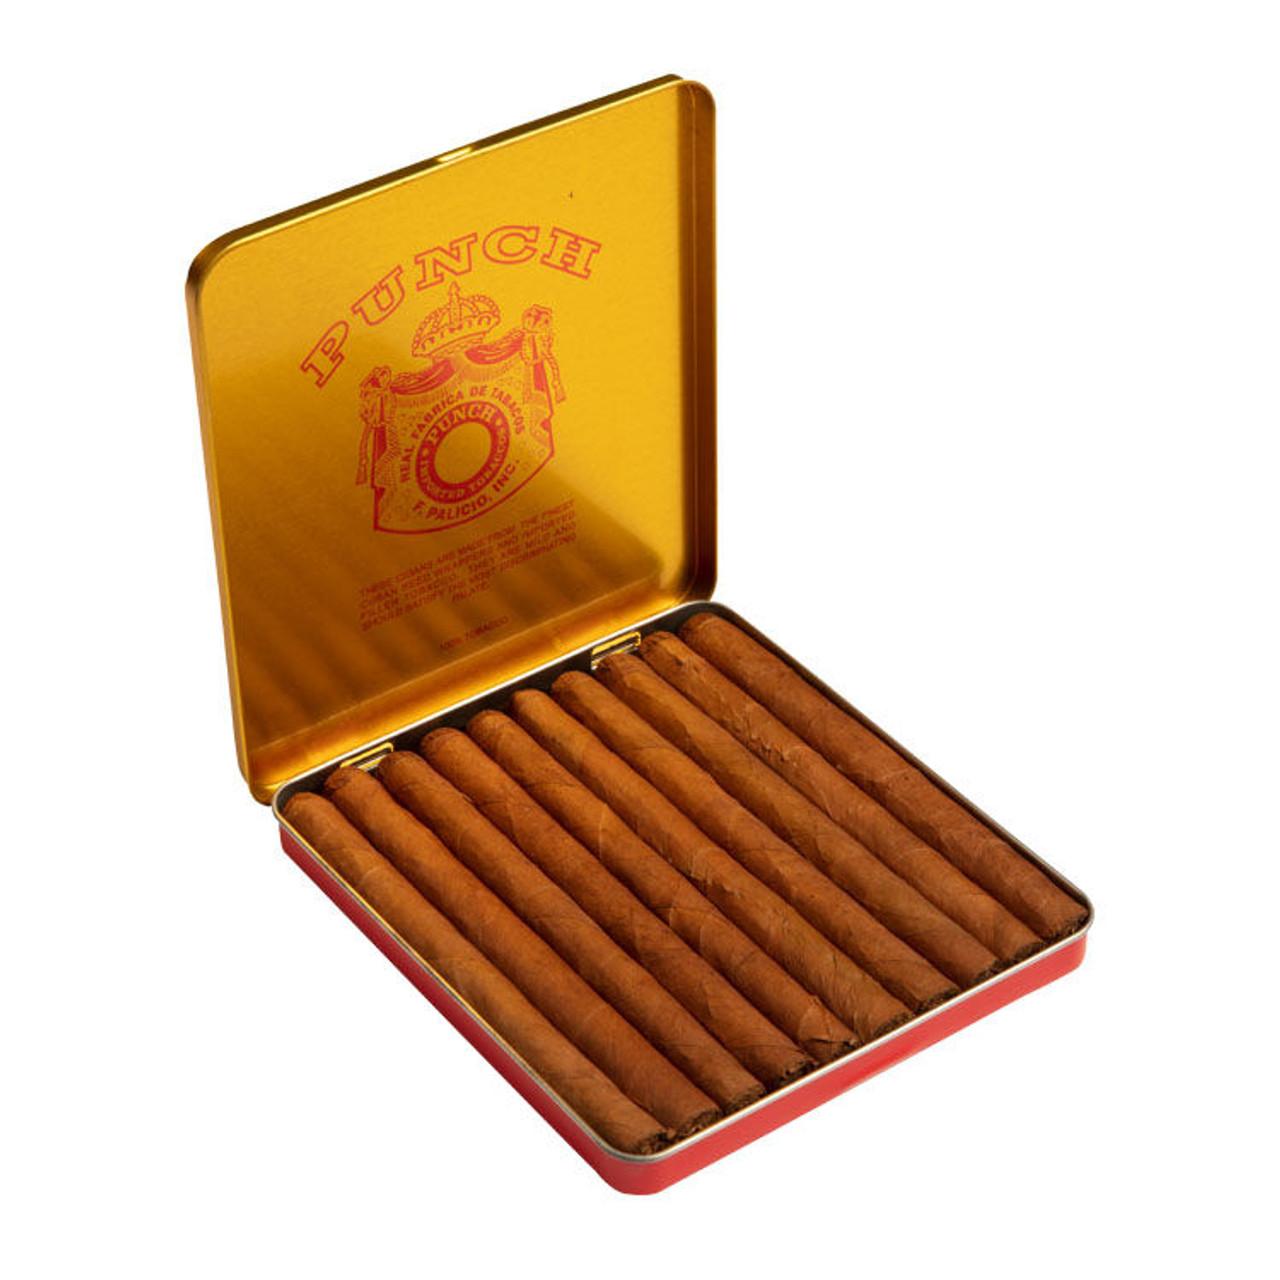 Punch Slim Panatellas (1 Tin of 10) Cigars - 4 x 28